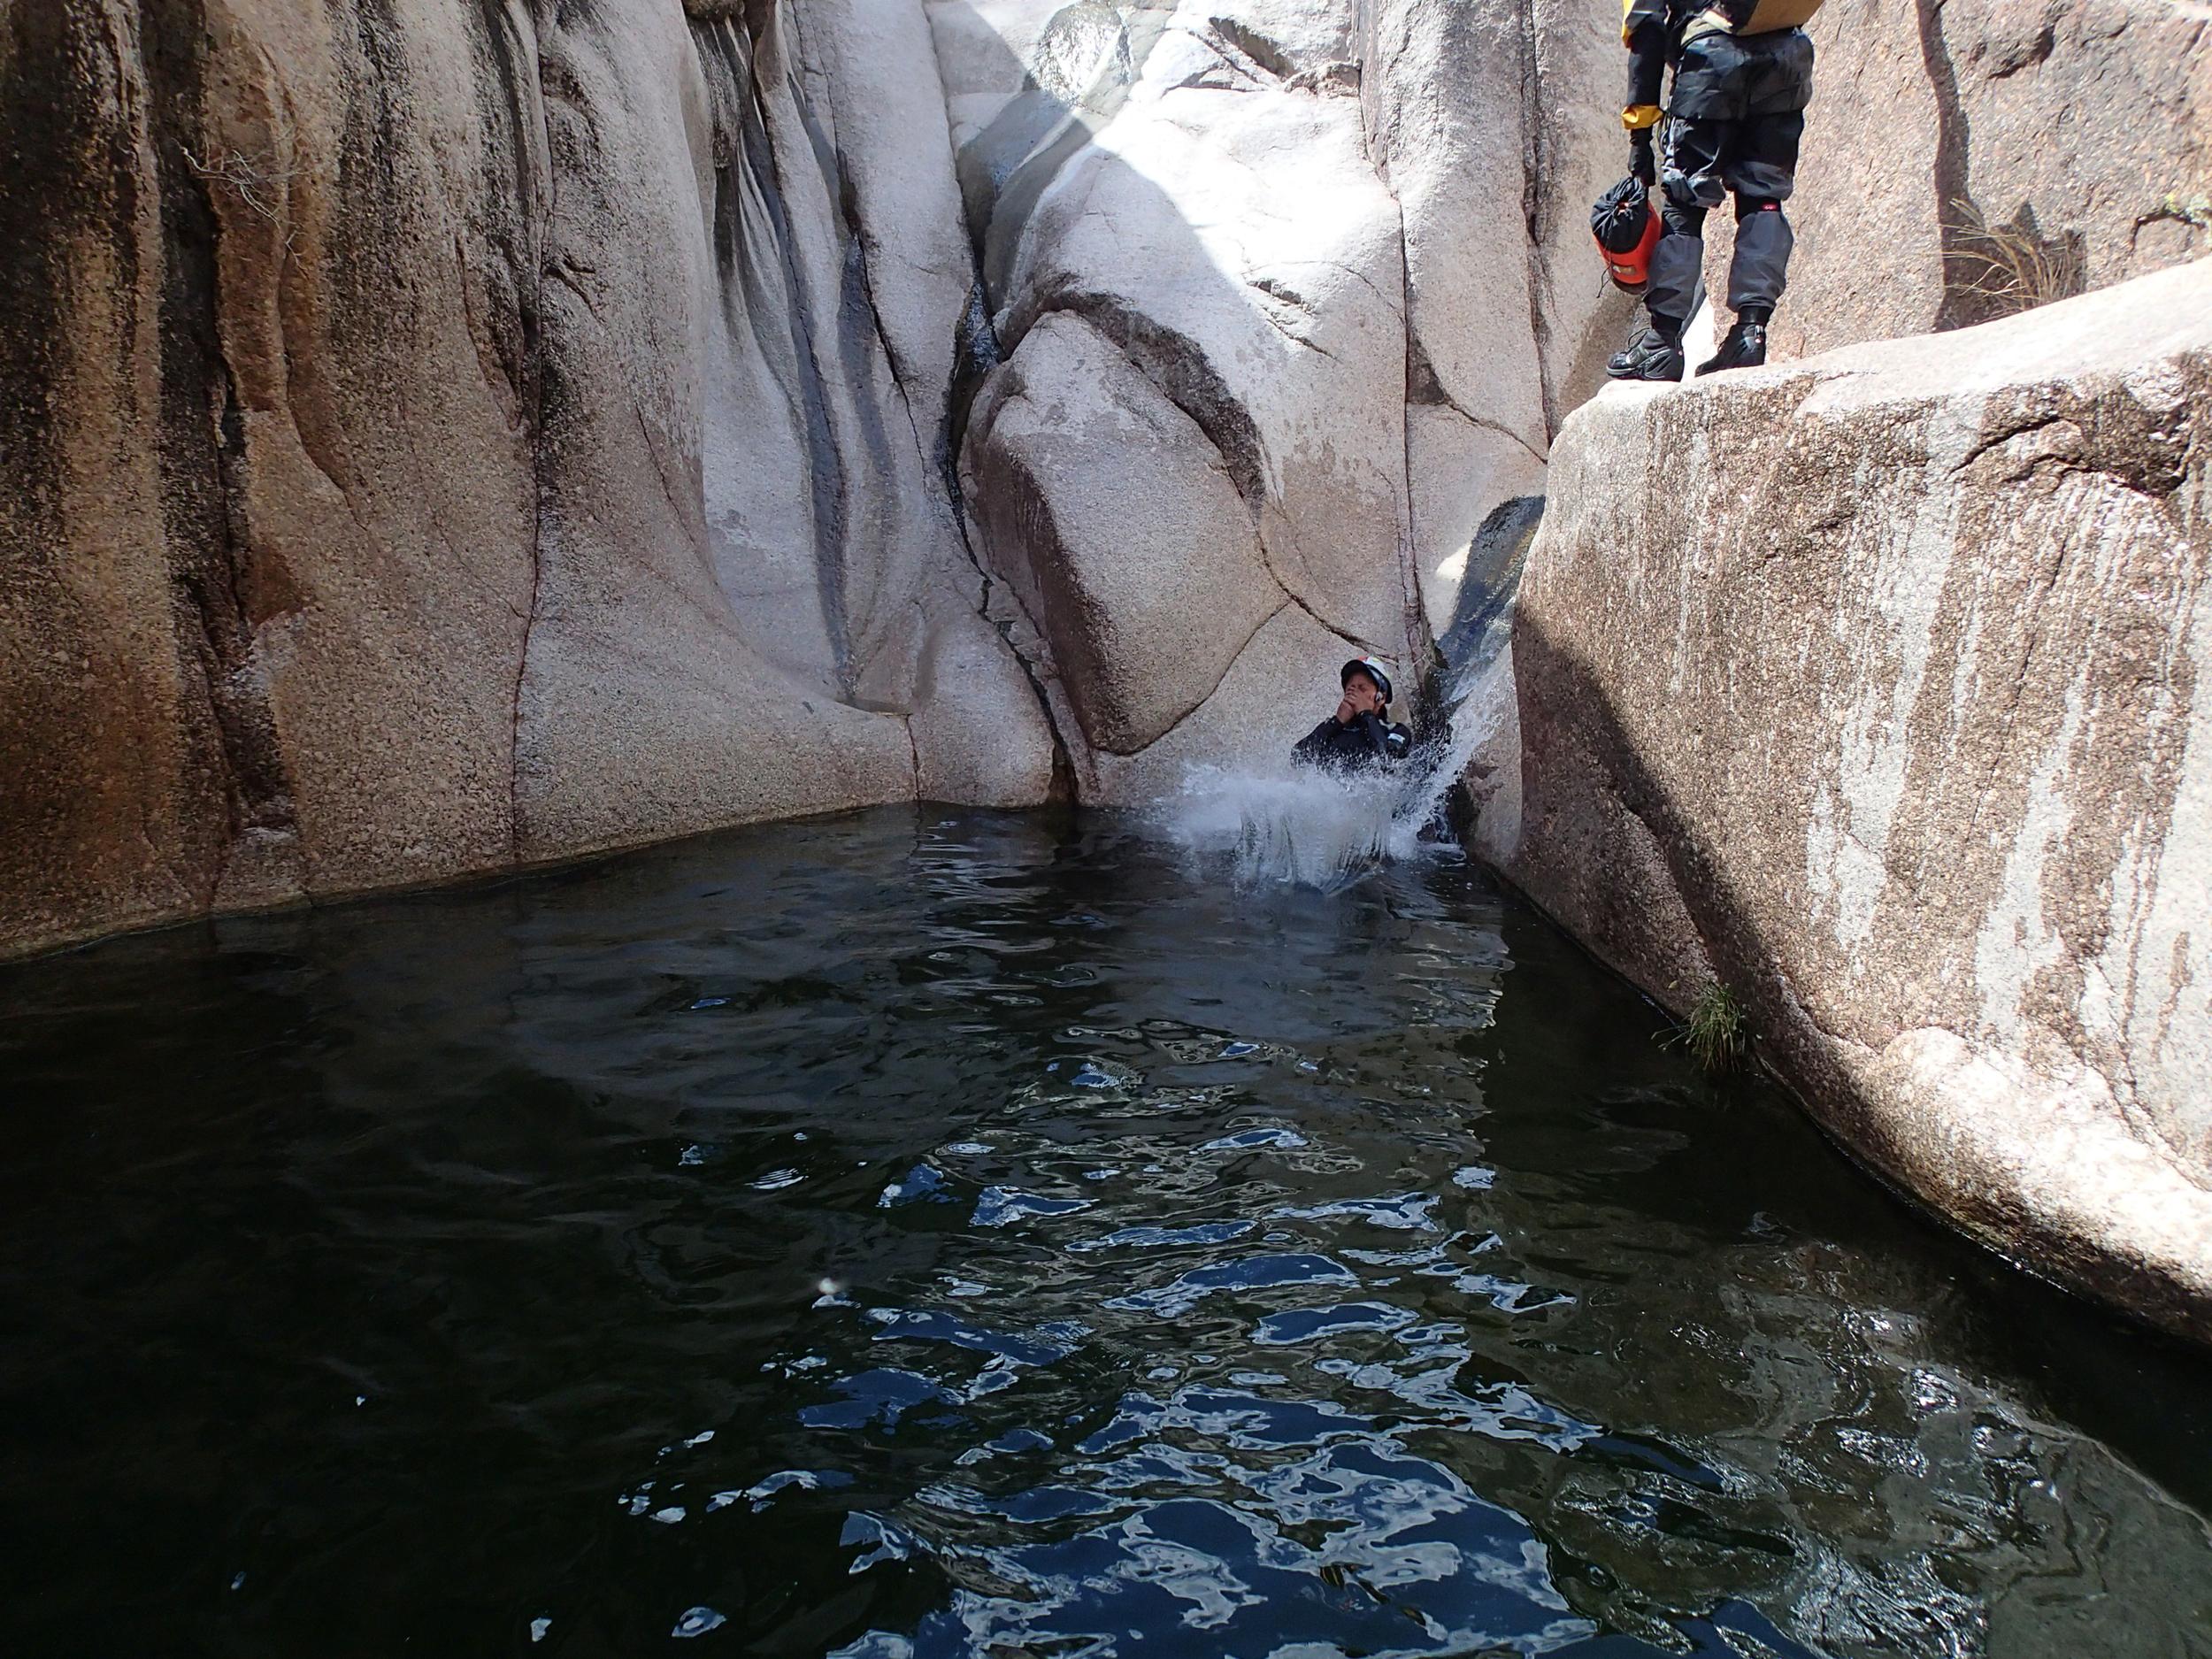 Waterslides Canyon, AZ - On Rope Canyoneering